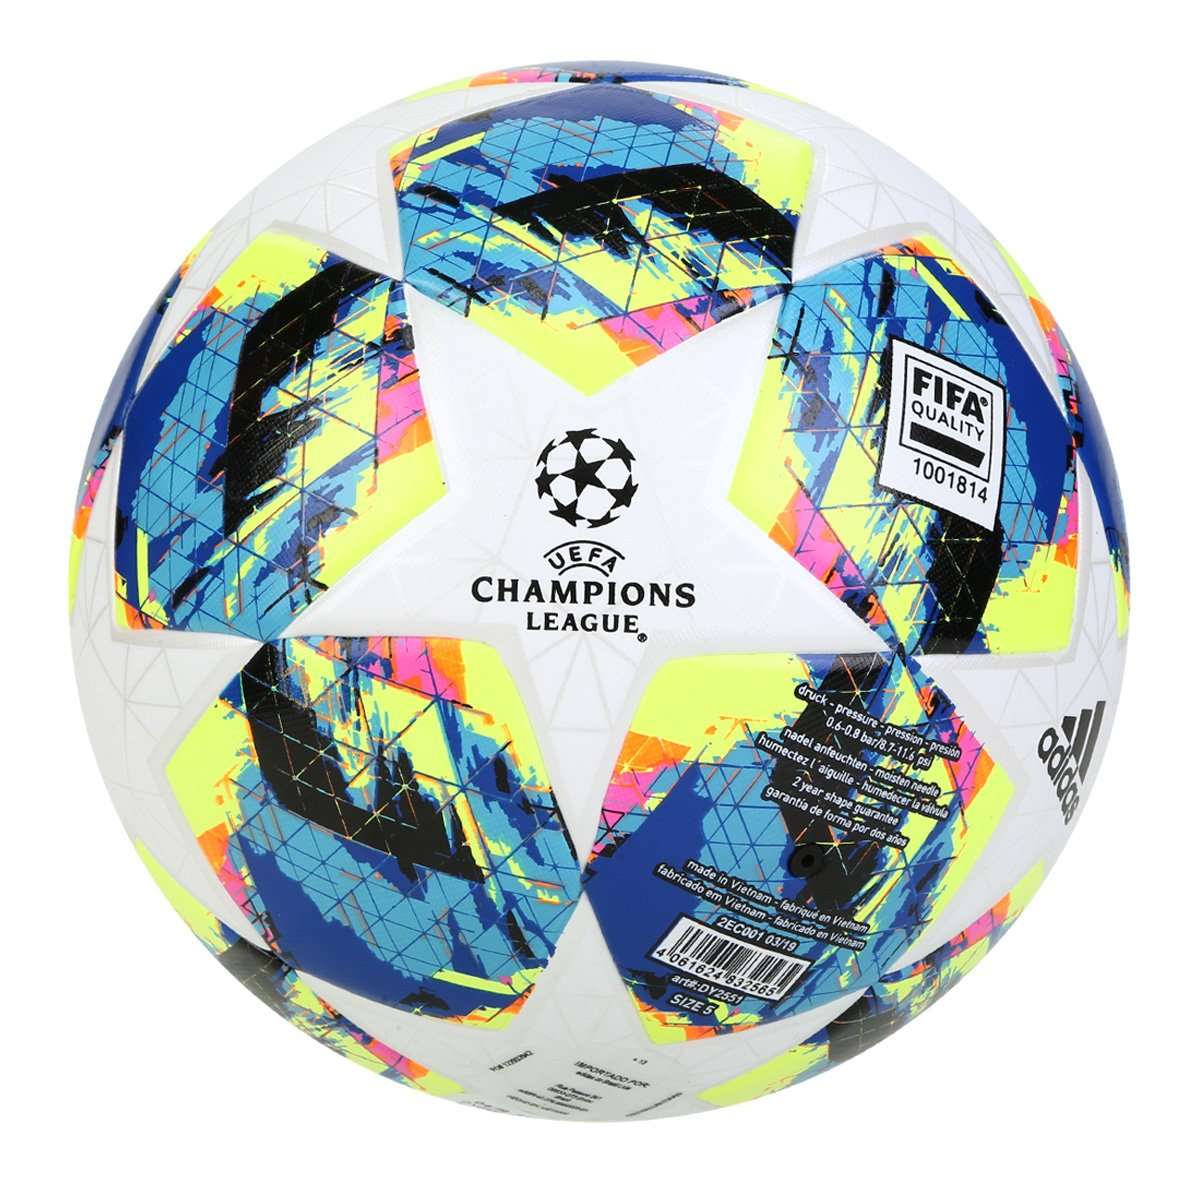 Bola de futebol da Champions League